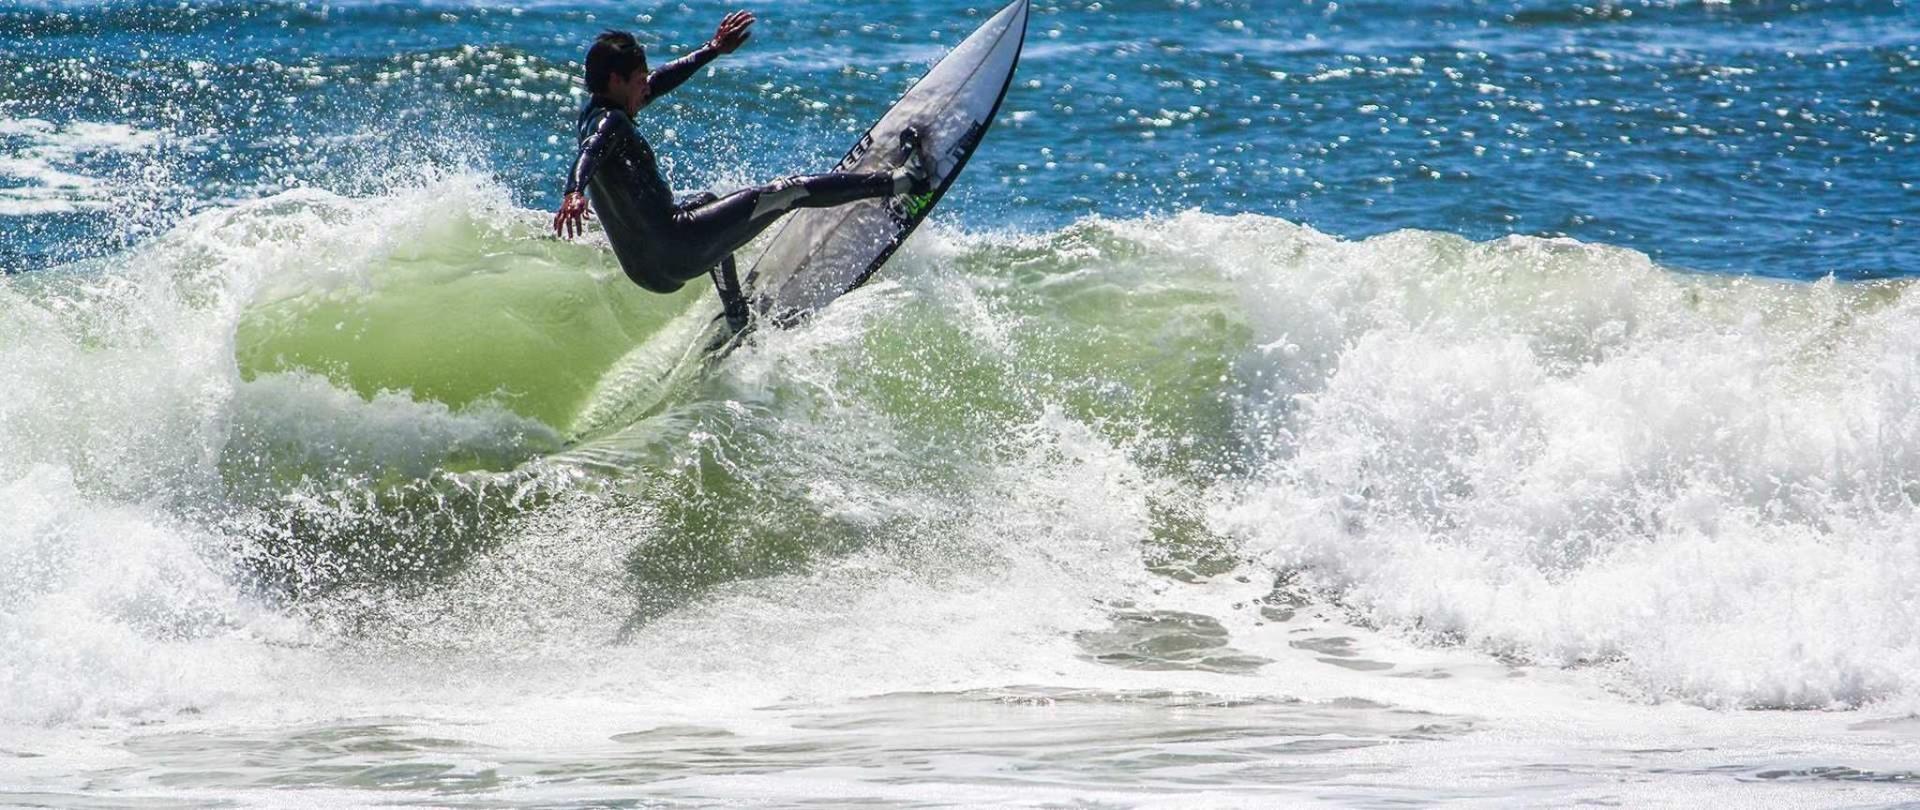 surf-tk.jpg.1920x810_default.jpeg.1920x0.jpeg